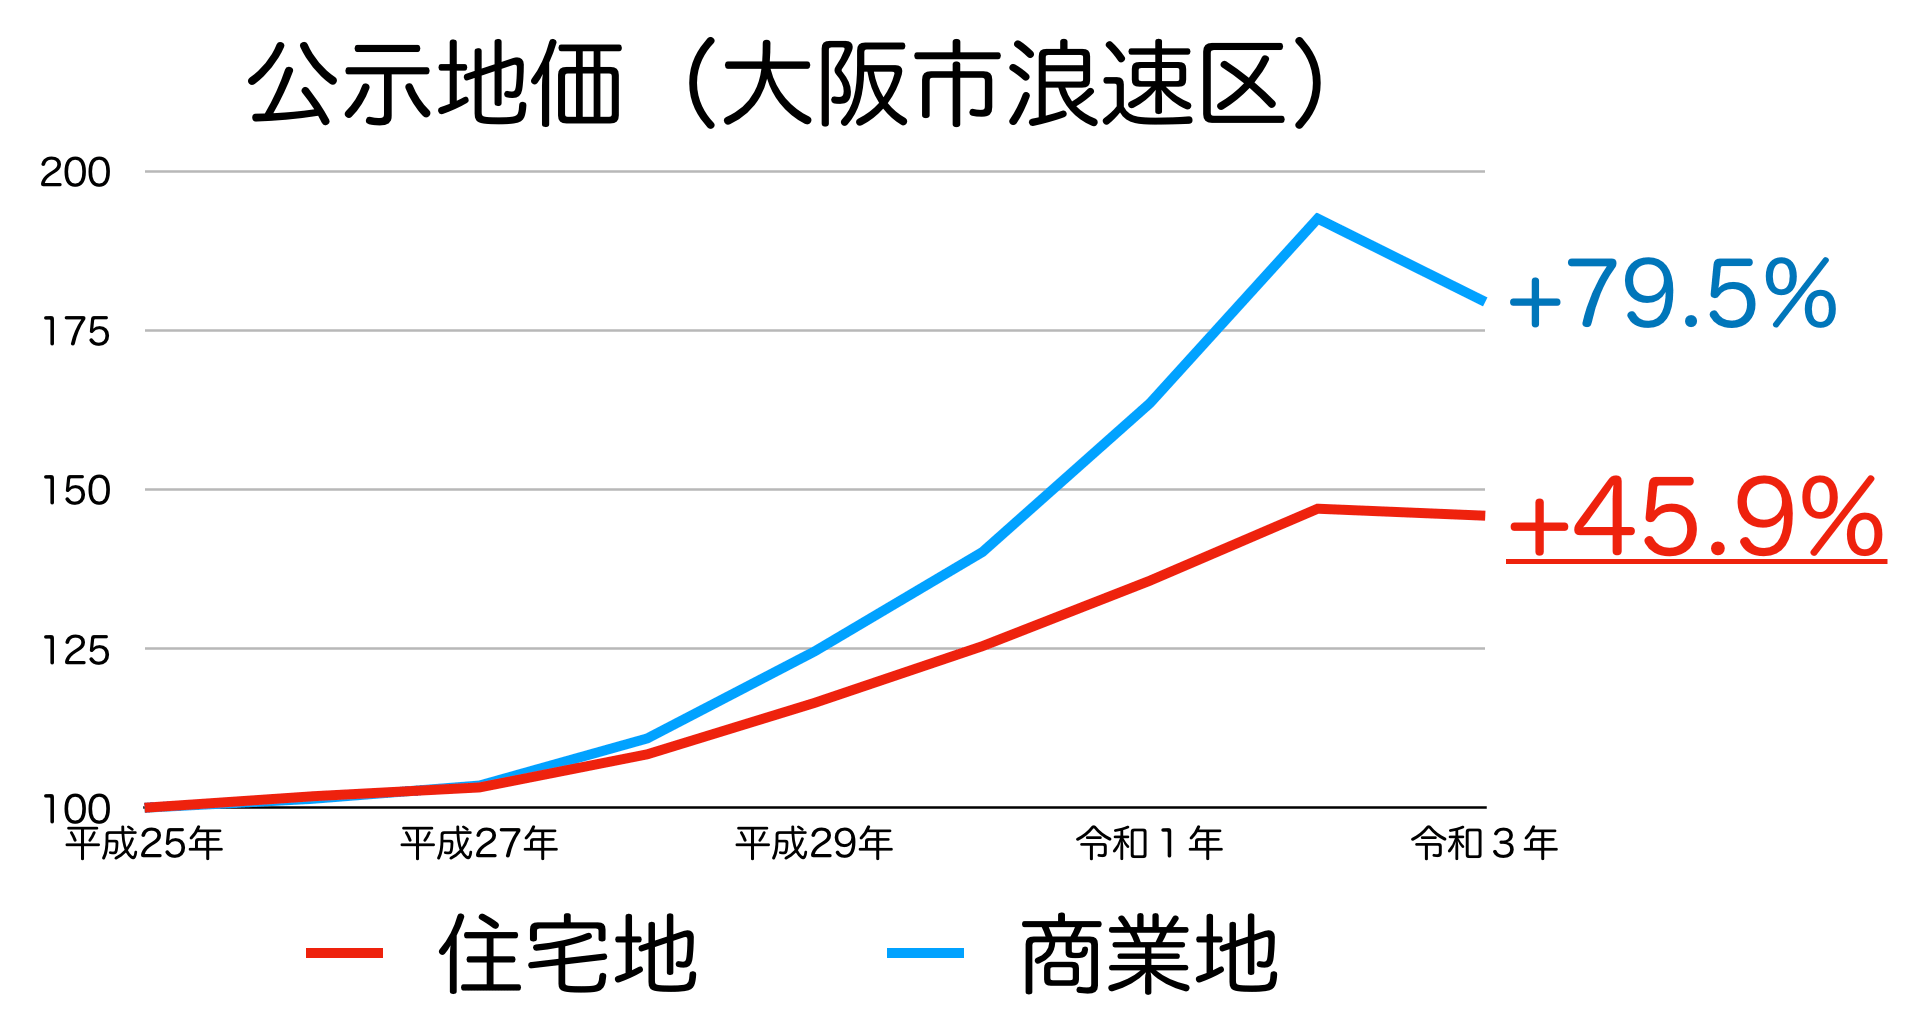 大阪市浪速区の公示地価の推移